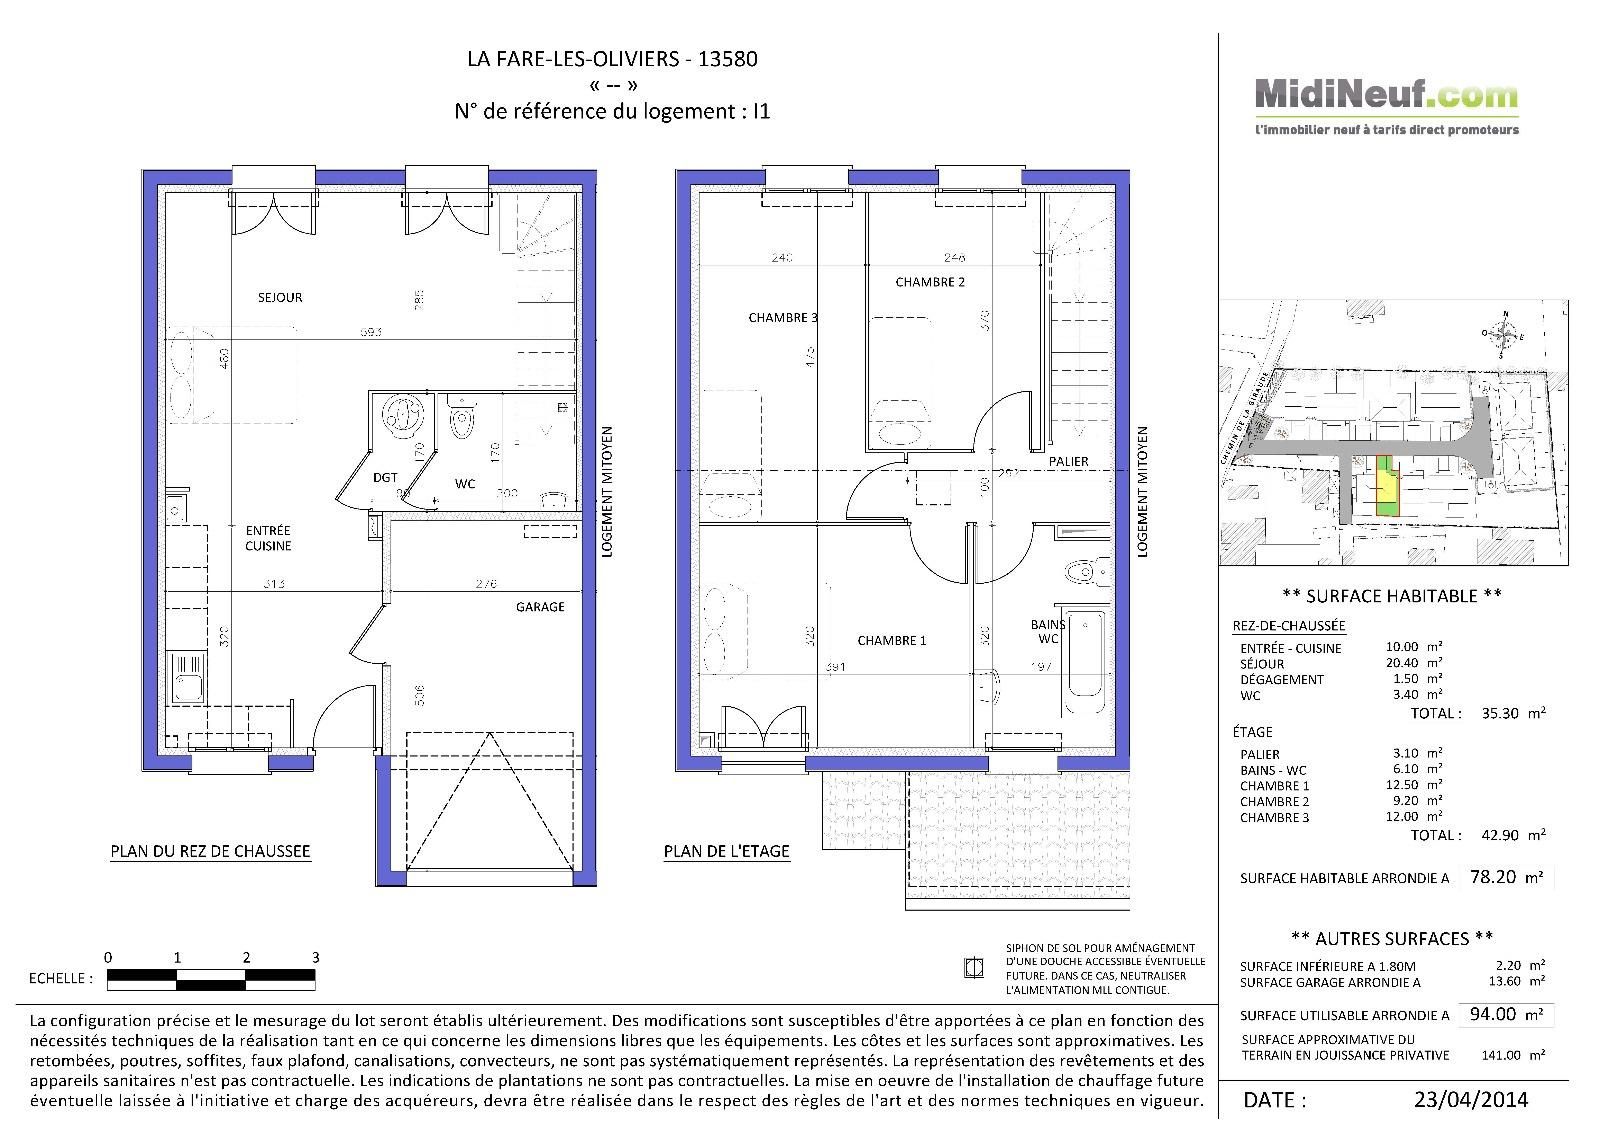 annonce villa 4 pieces la fare les oliviers vente. Black Bedroom Furniture Sets. Home Design Ideas